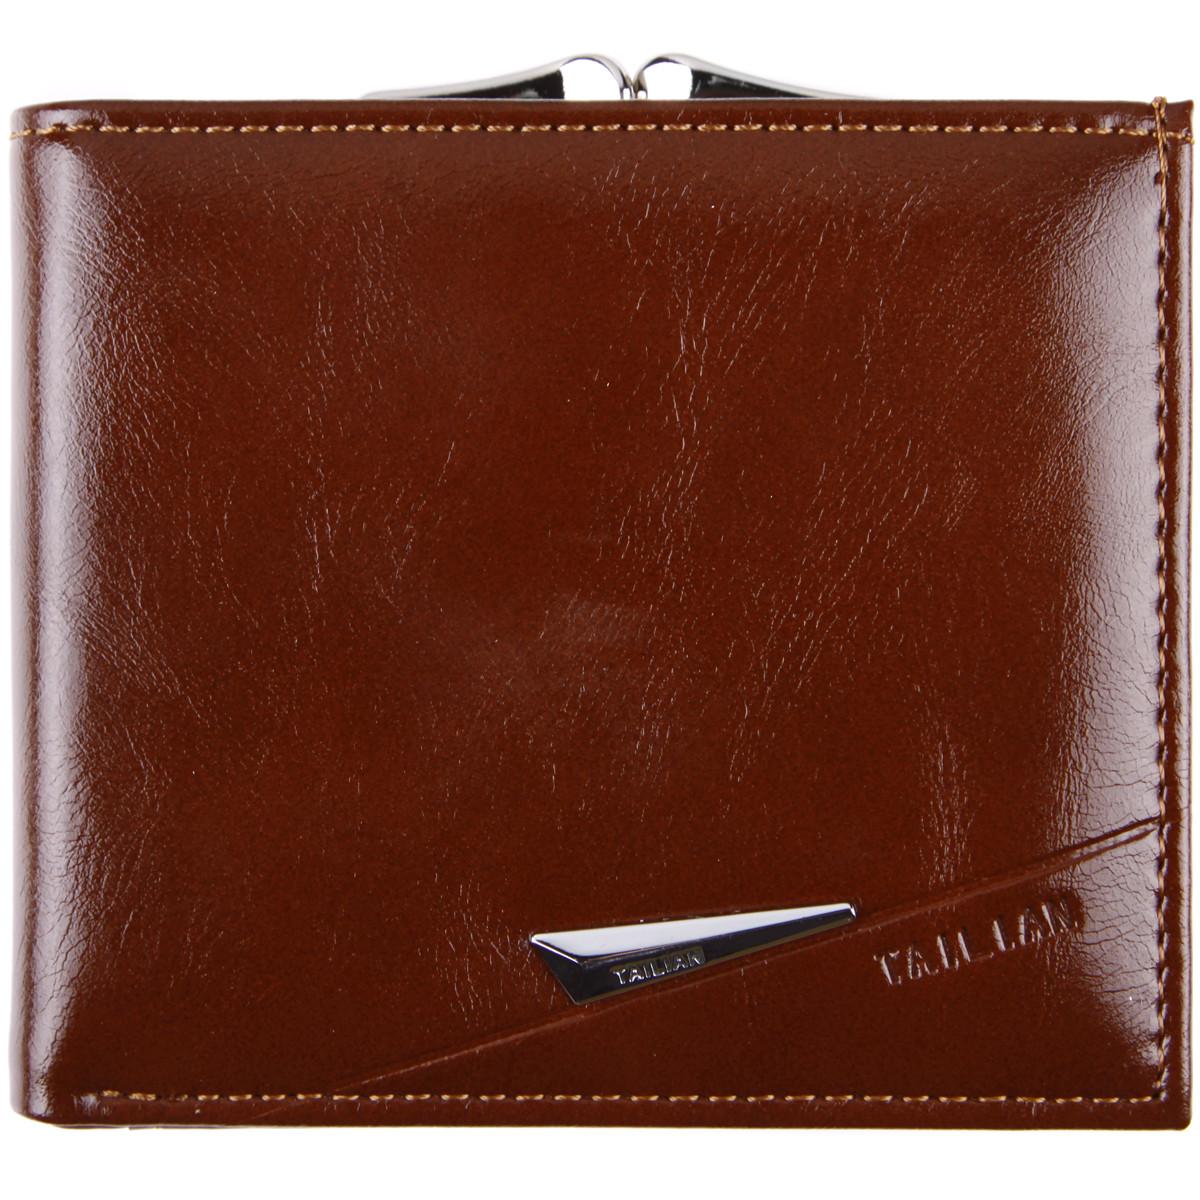 Портмоне женский коричневый TAILIAN застёжка кнопка 11х9,5х2,5  м Т777-052кор